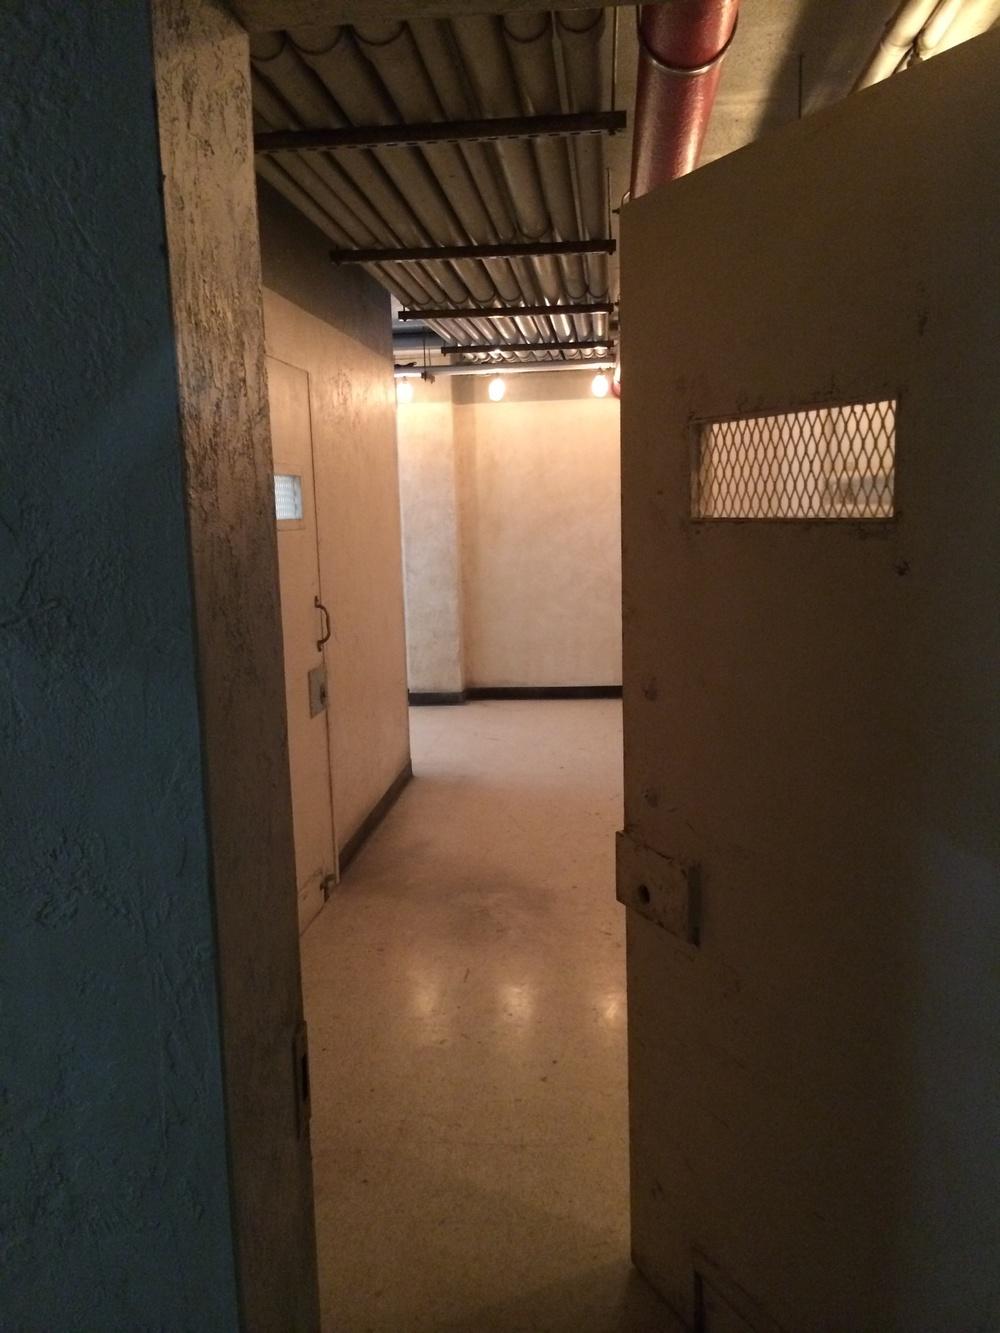 25b asylum cell 4.jpg